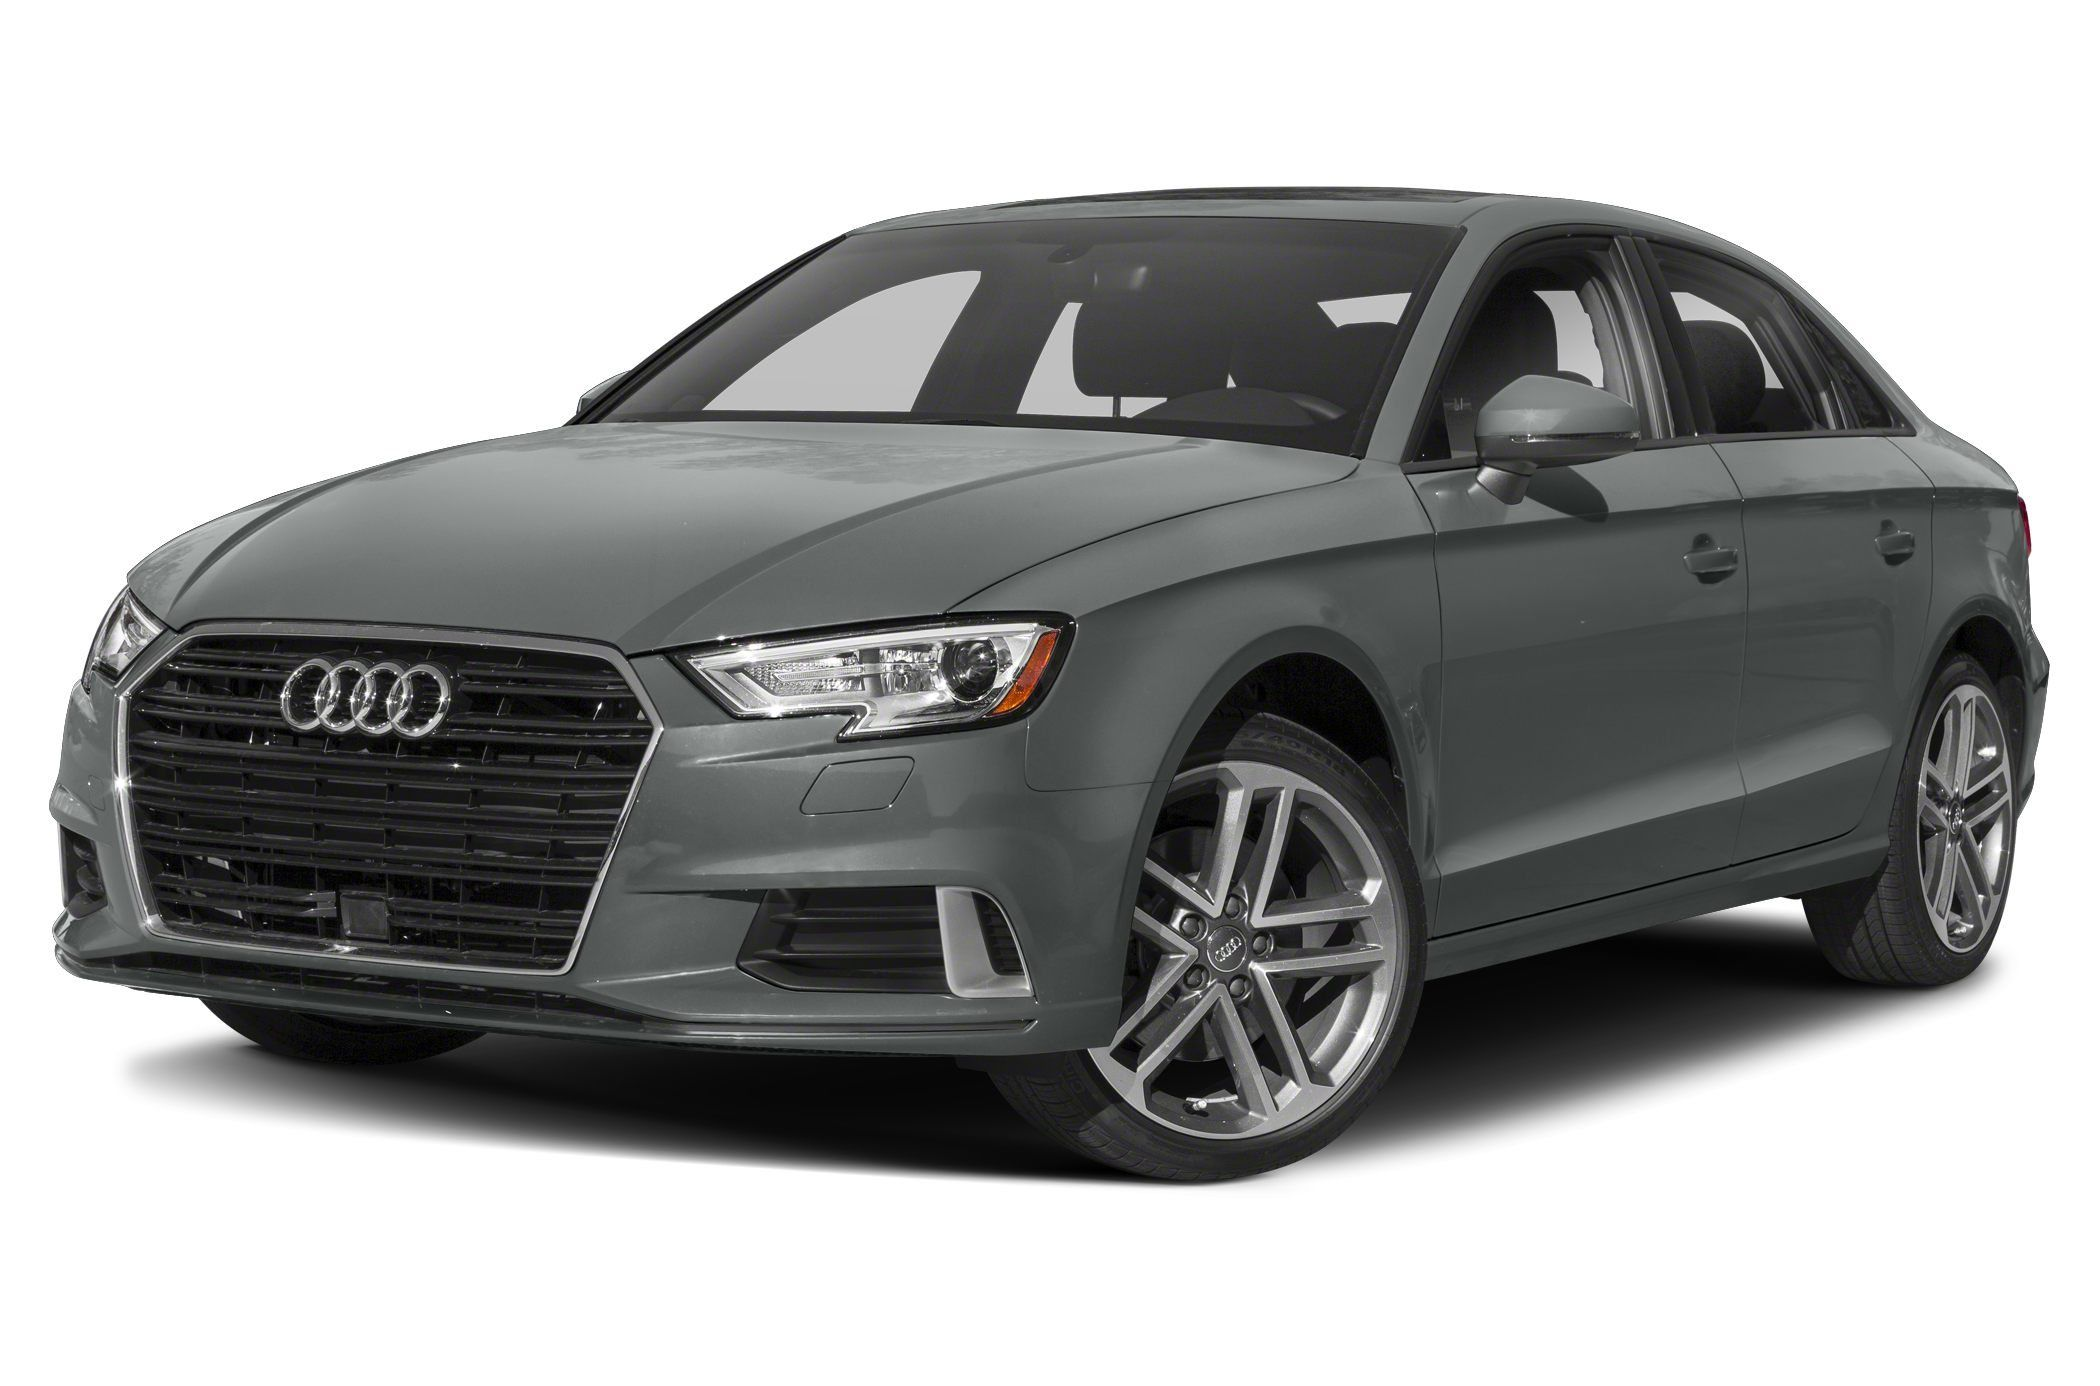 2020 Audi A3 Model in 2020 Audi, Audi a3 sedan, Audi price